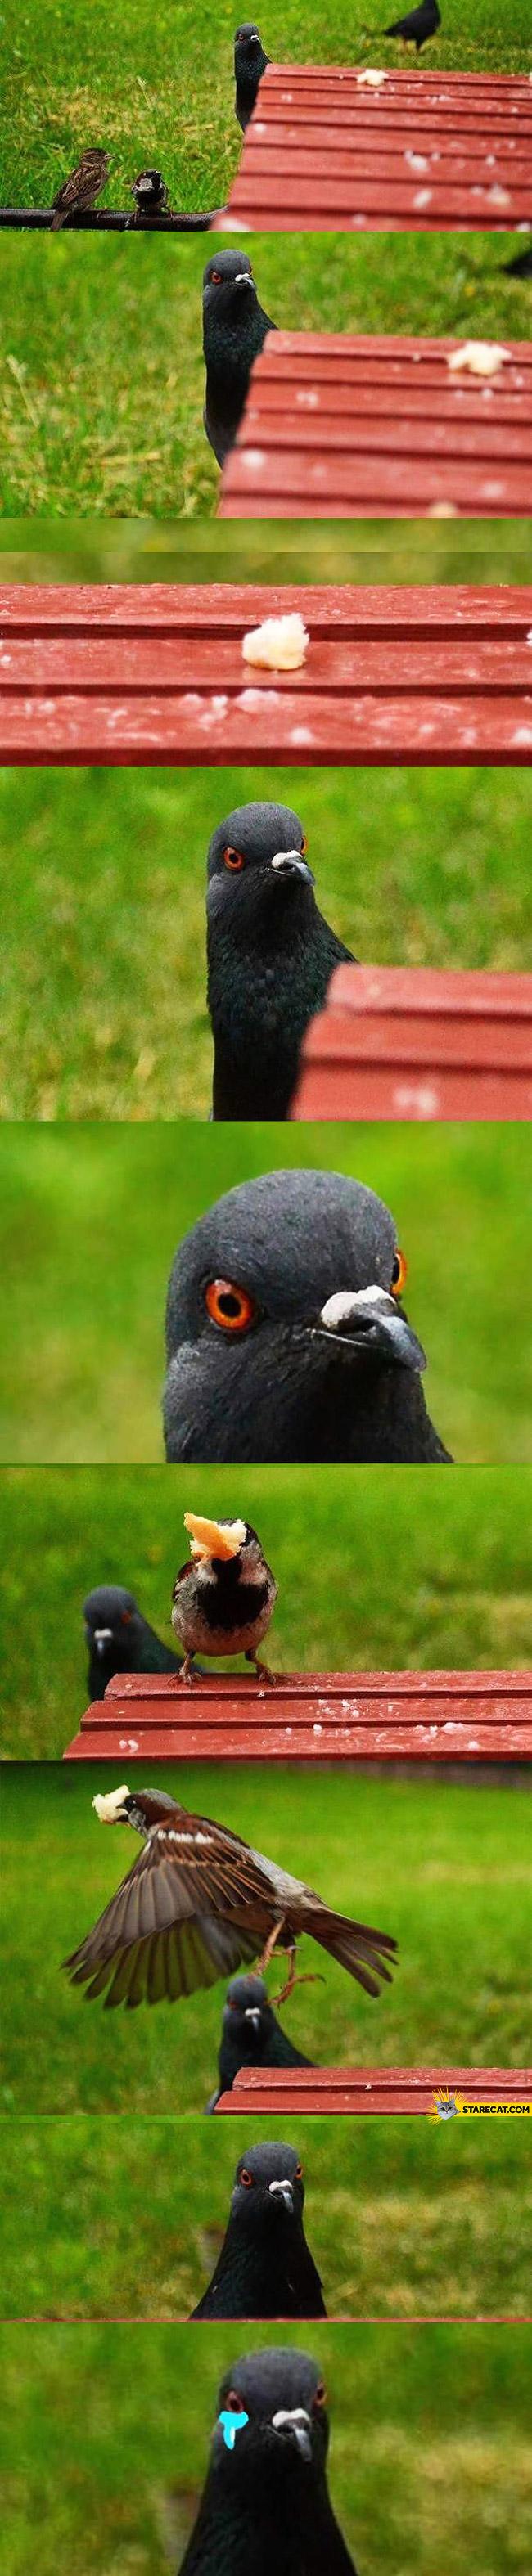 Sad pigeon crying